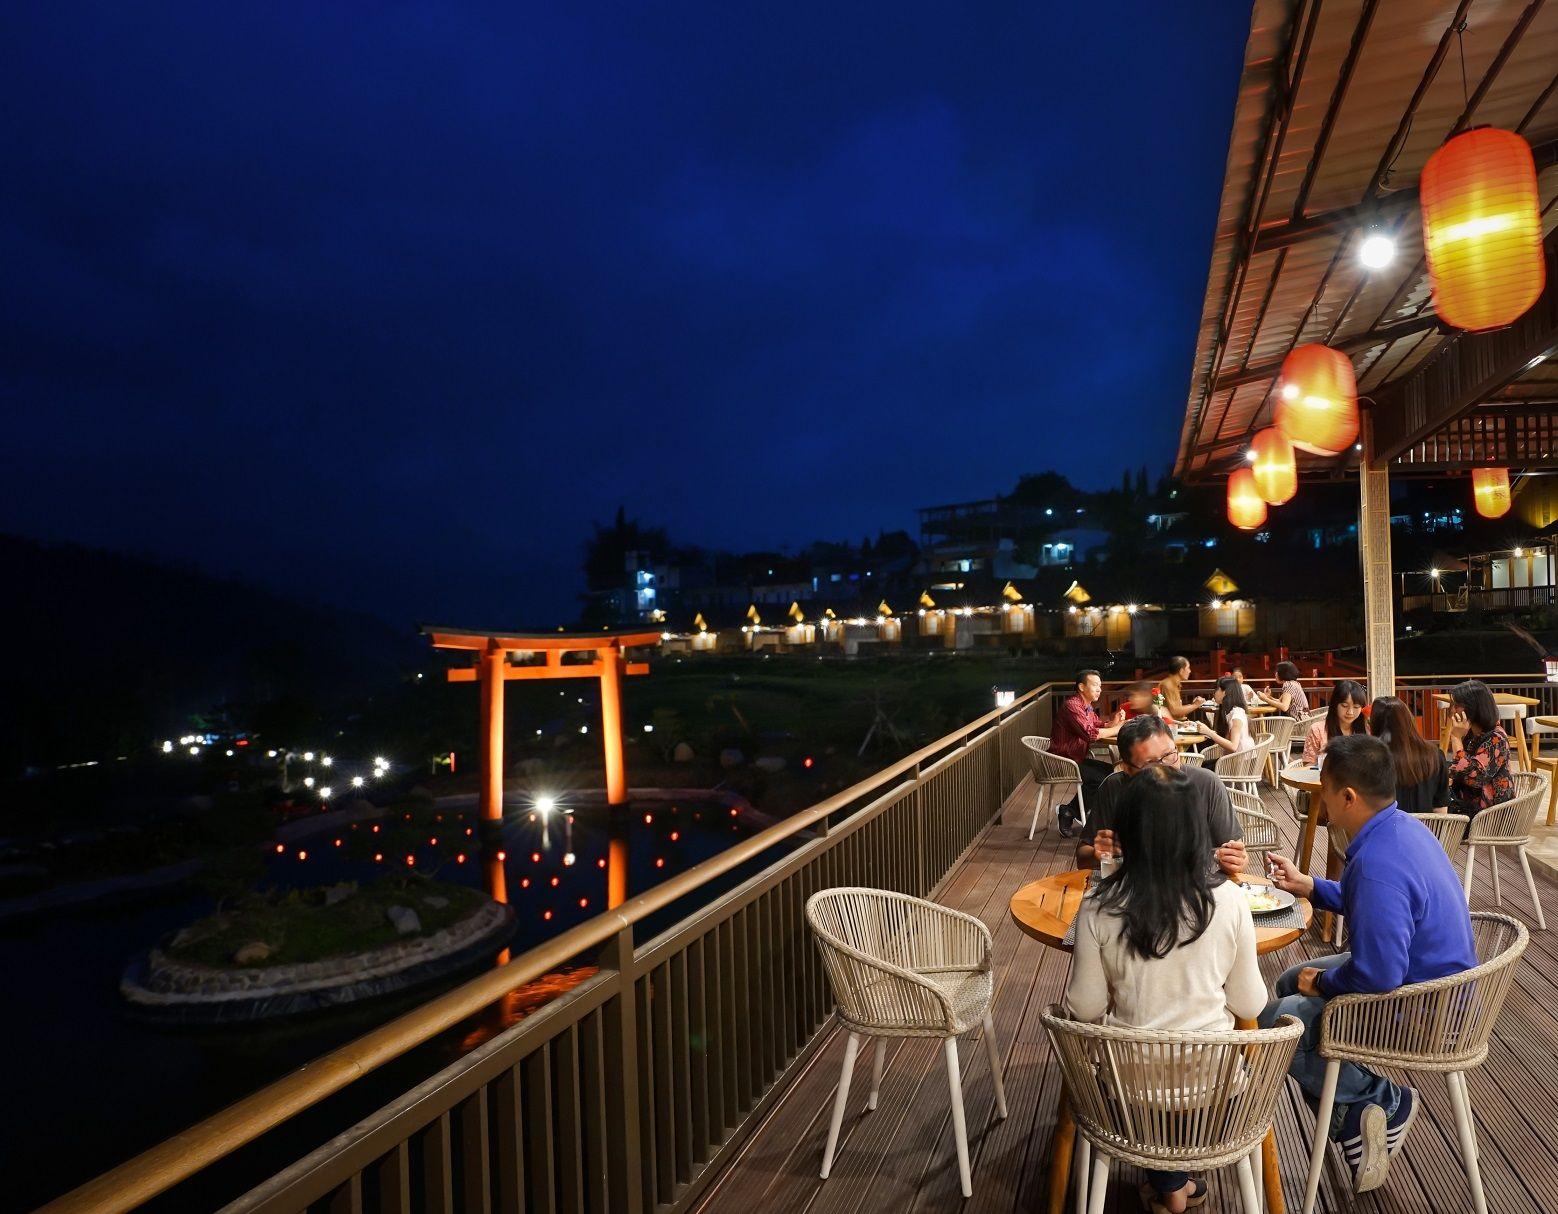 The Onsen Hot Spring Resort The Onsen Hot Spring Resort